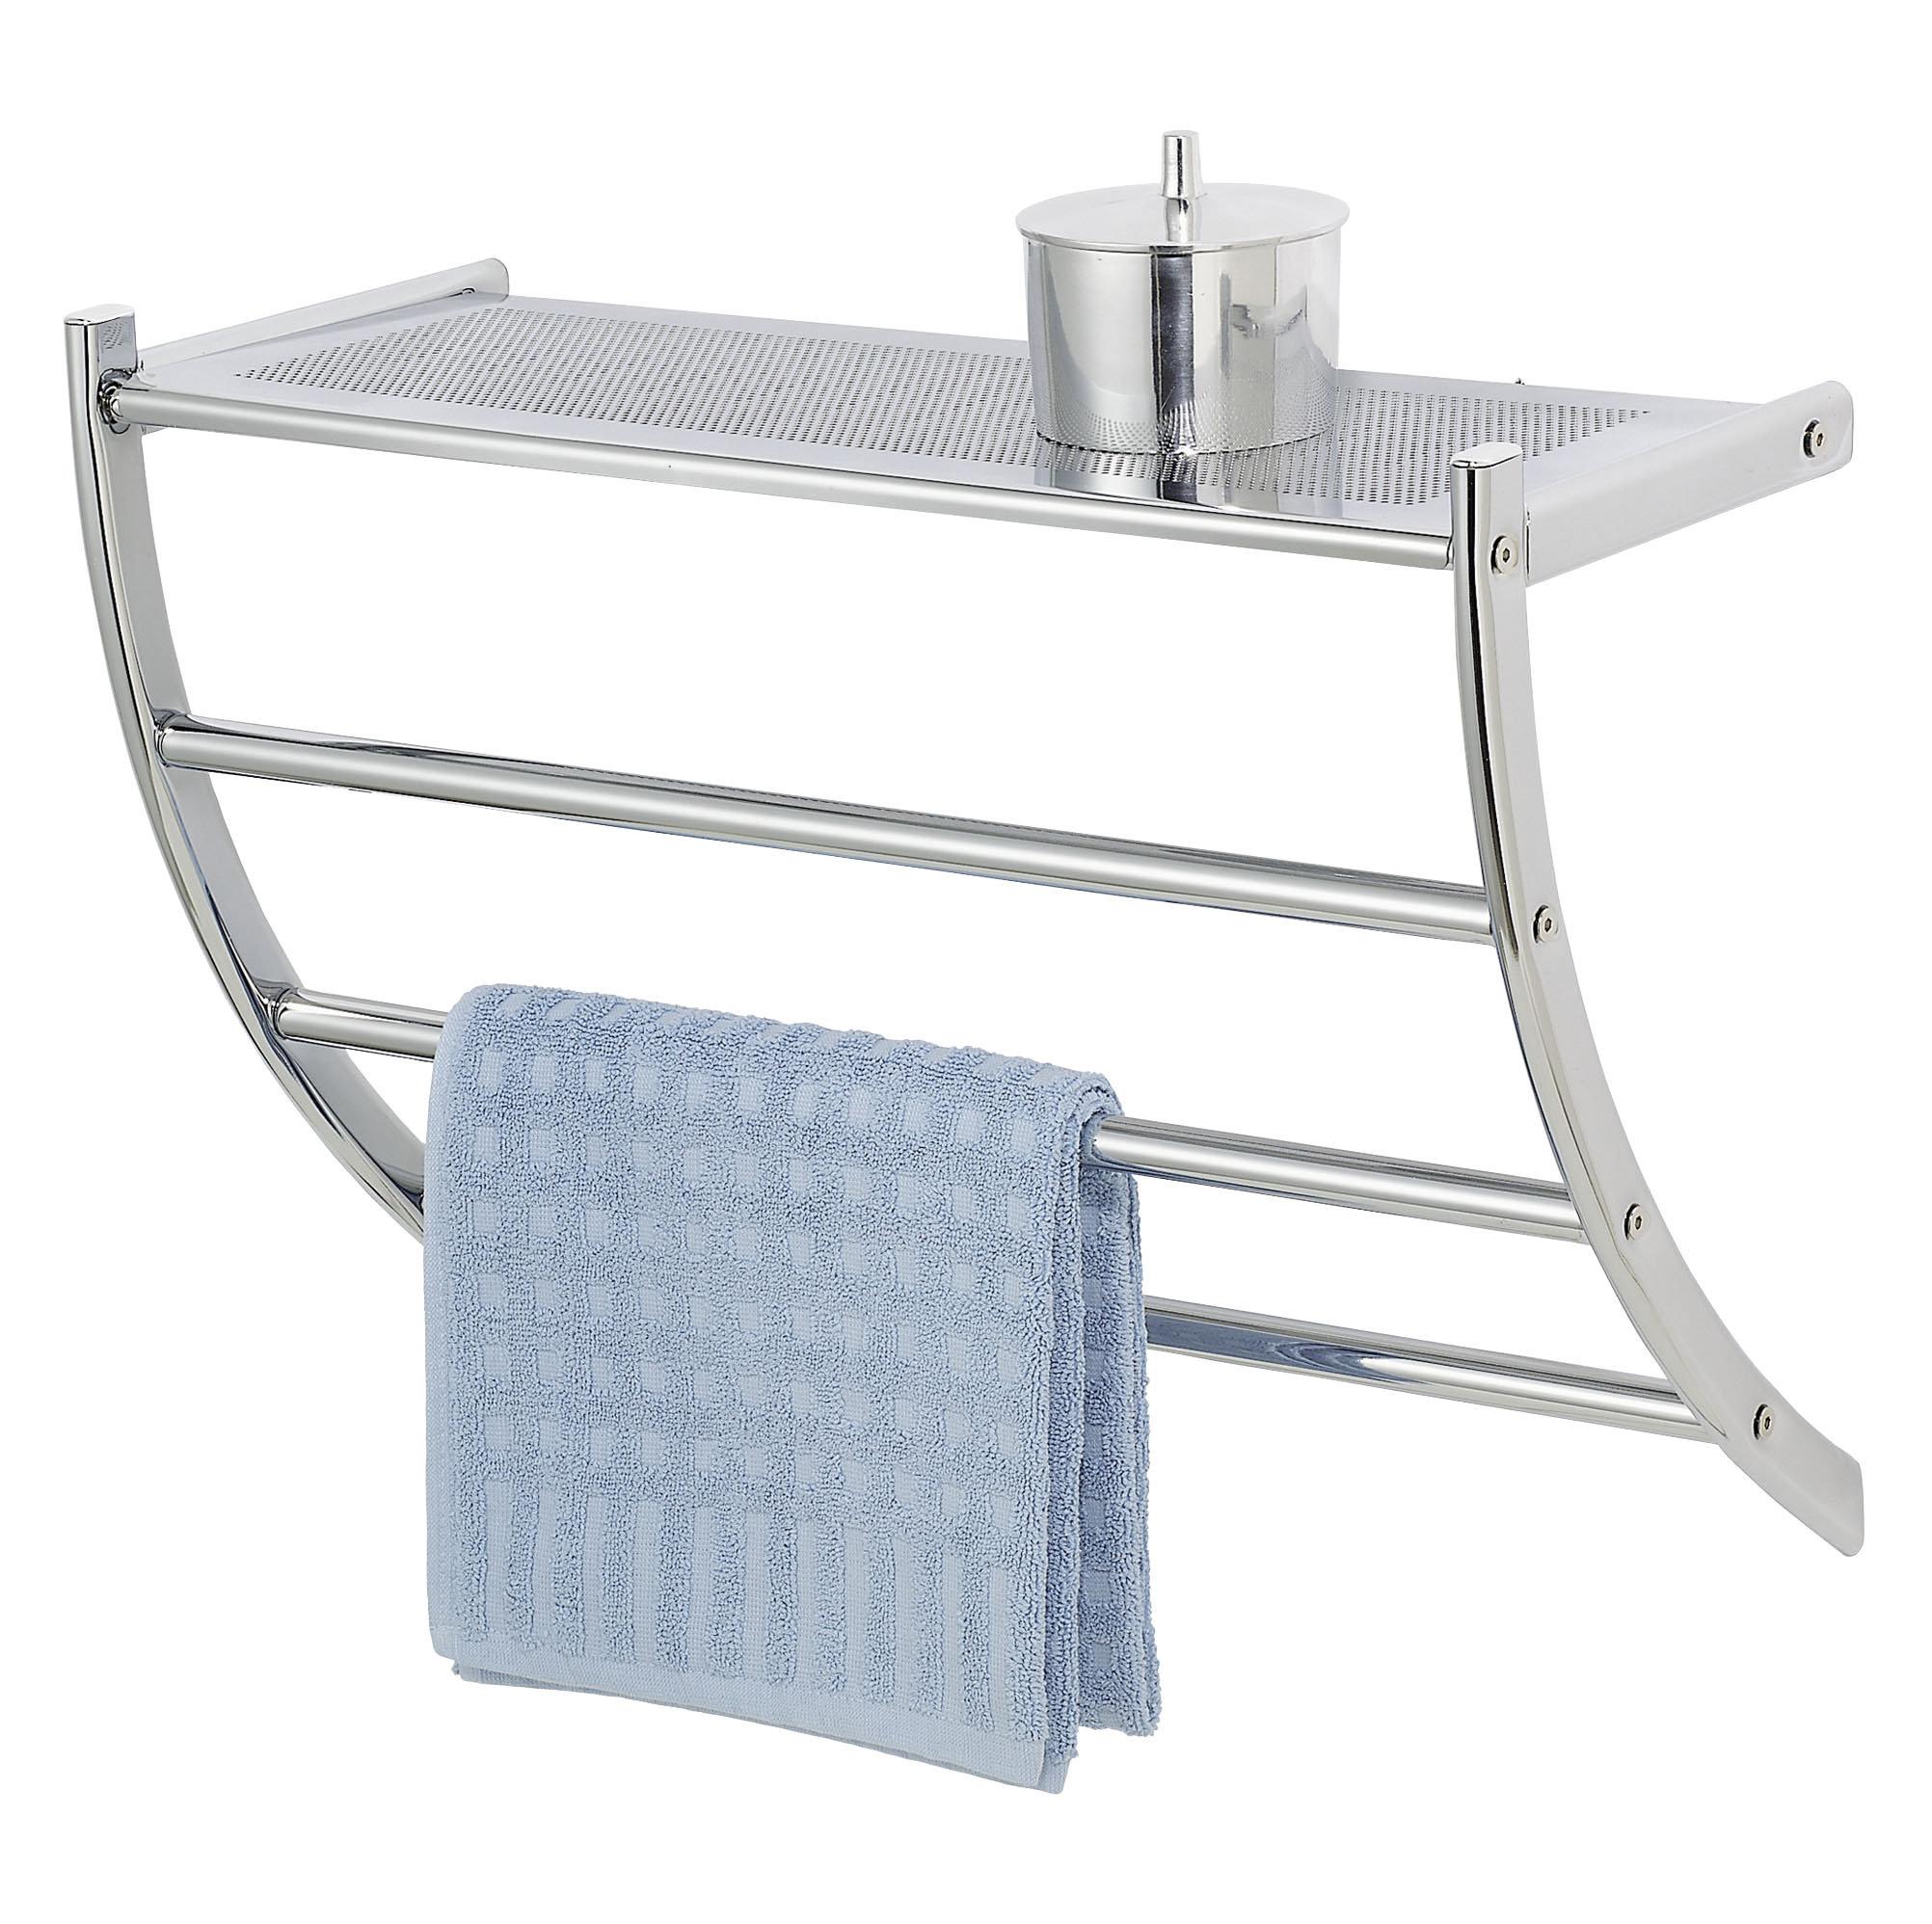 Wenko Pescara Wall Mounted Exclusive Shelf and Towel Rail & Reviews ...